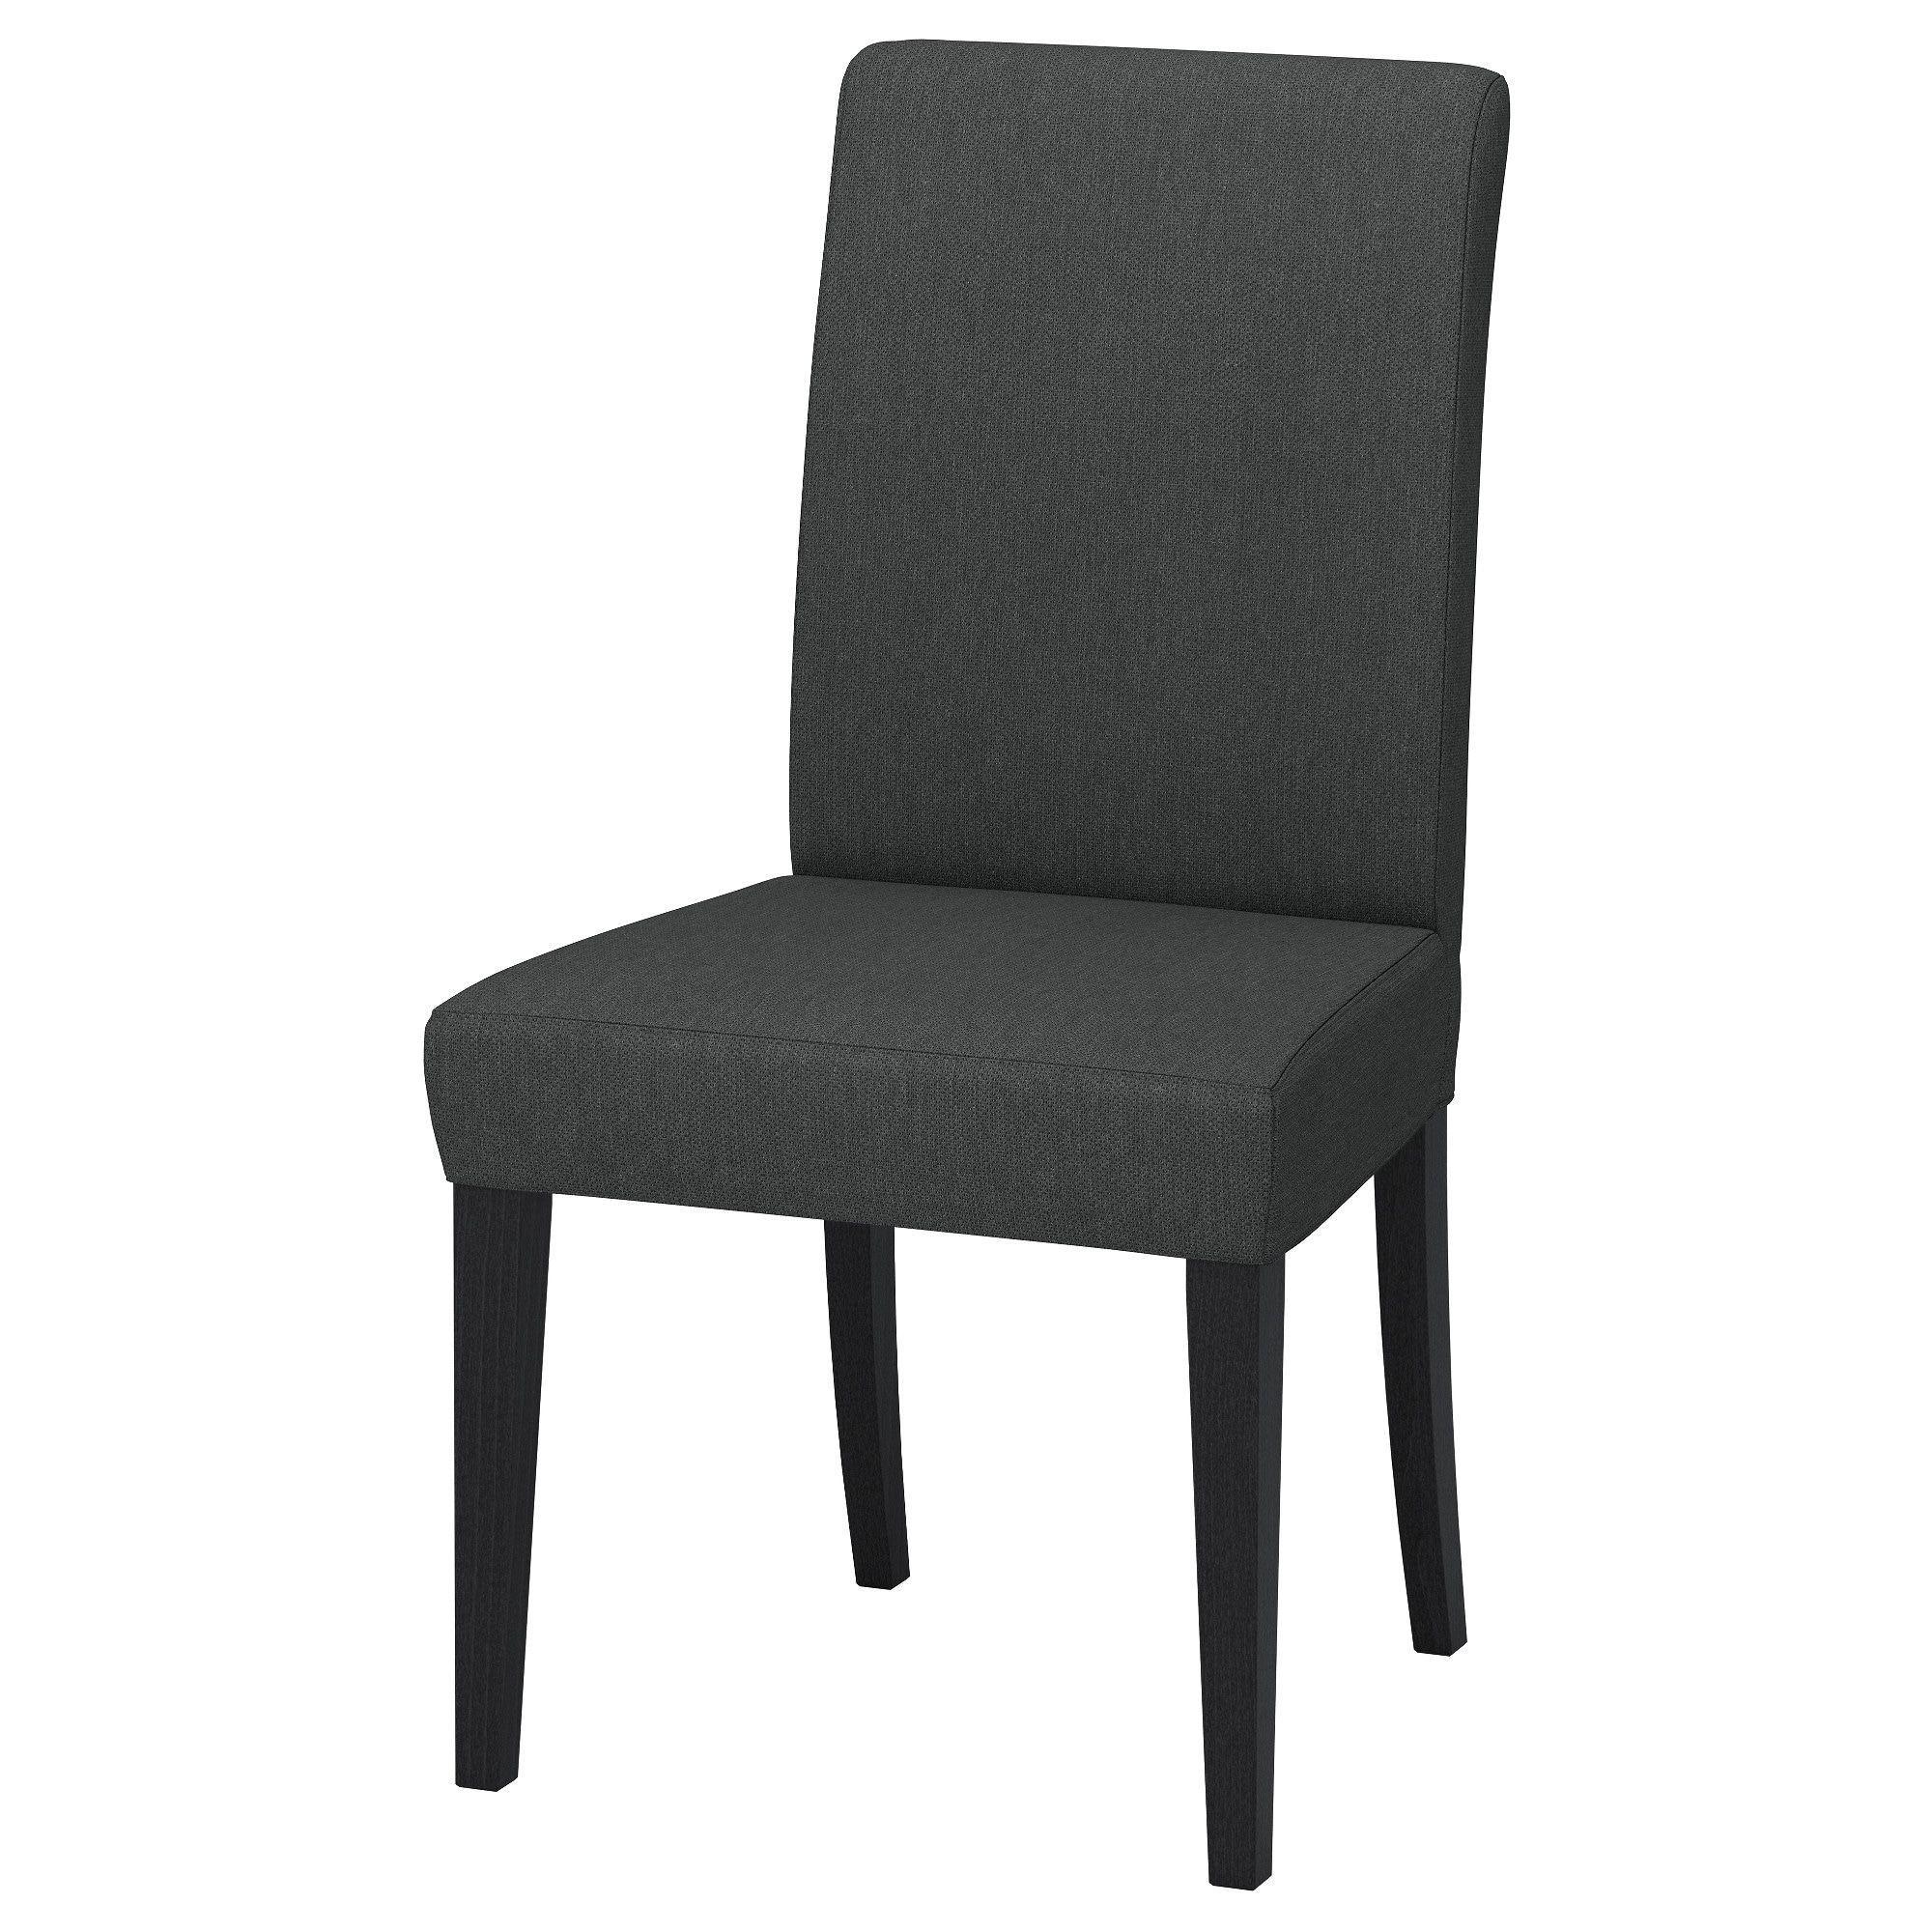 Ikea Barhocker Henriksdal